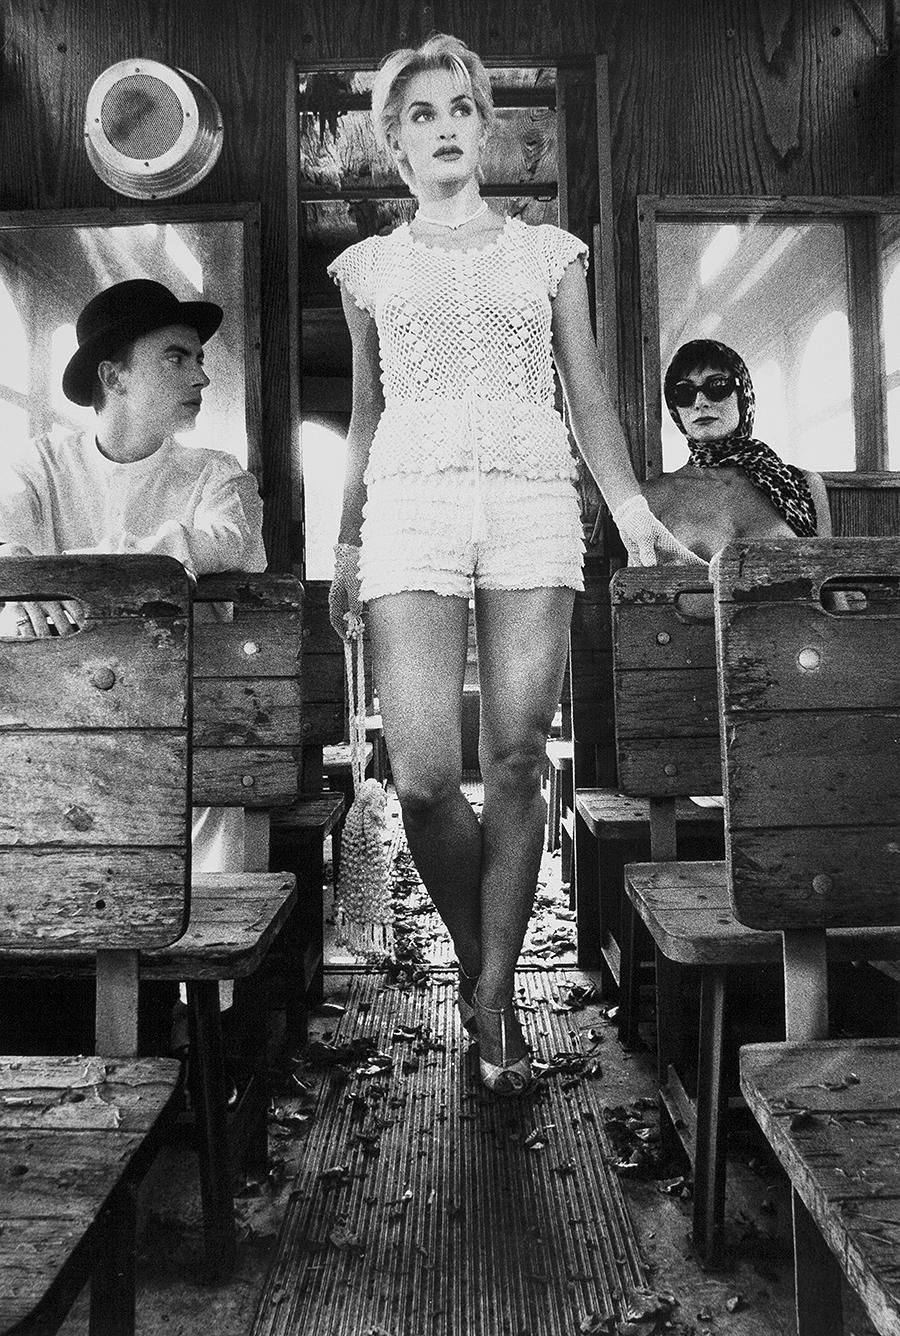 Tony_Ward_early_erotic_tableaux_vivants_old_bus